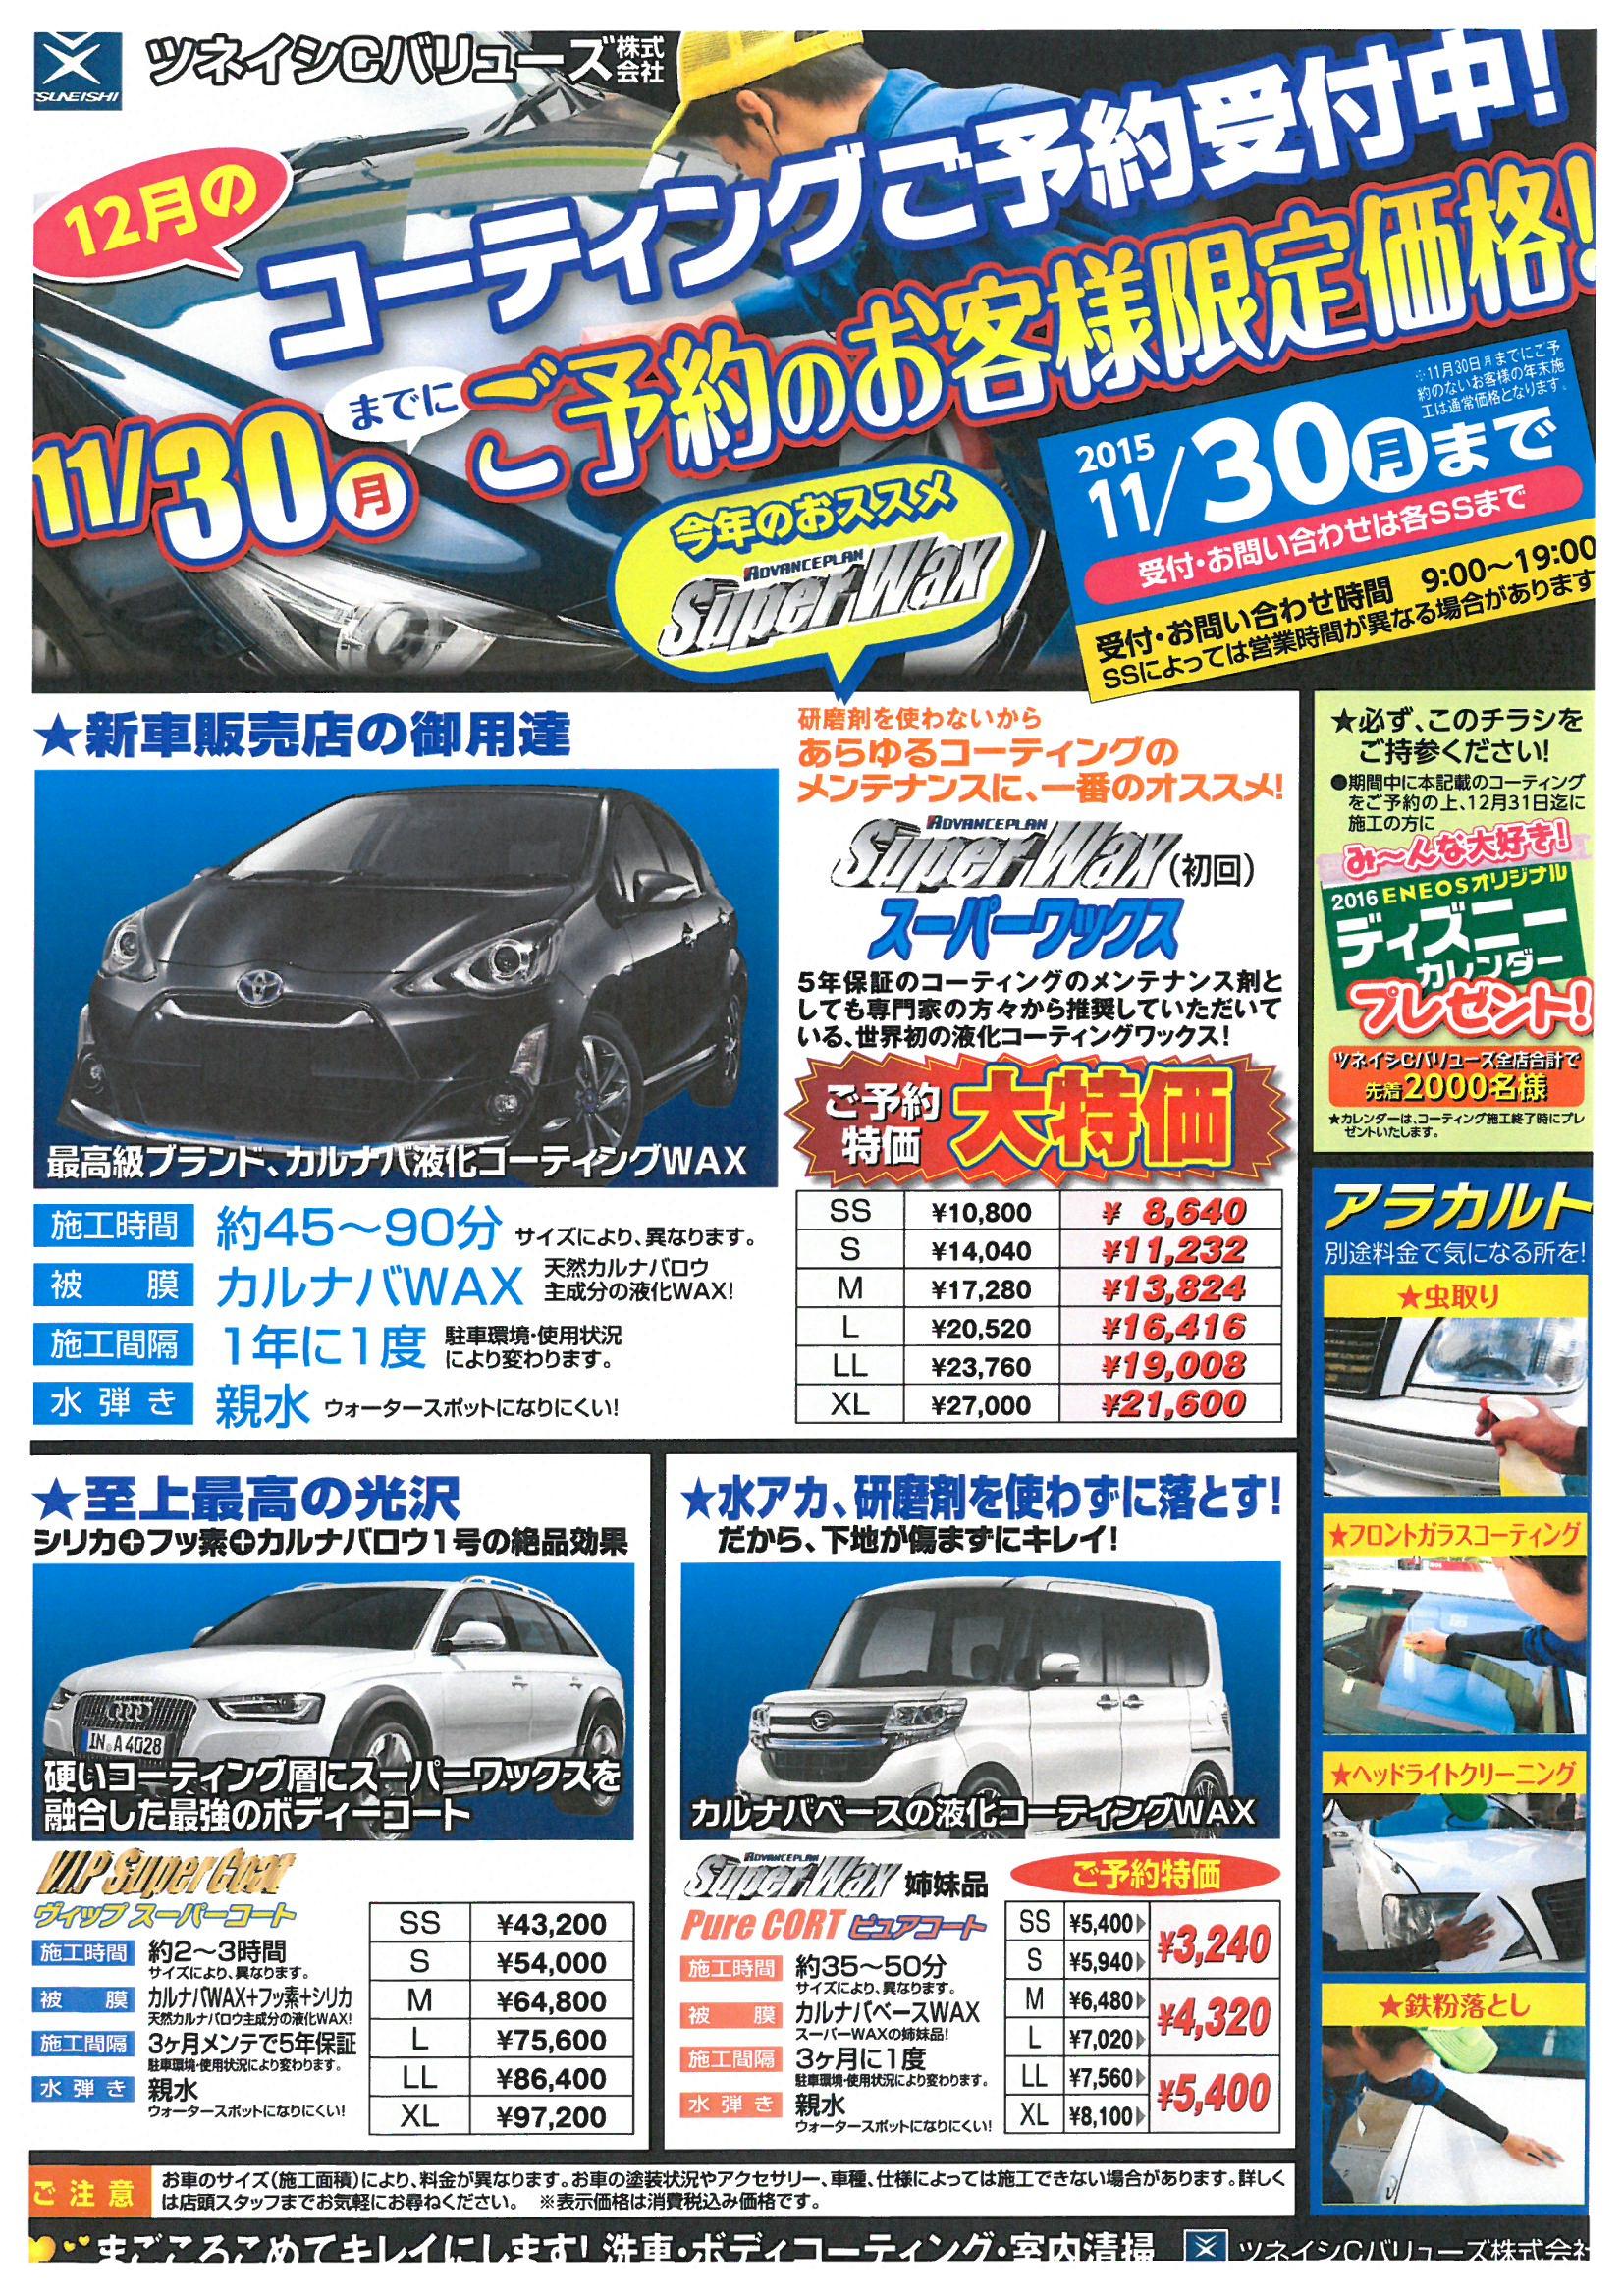 【Super Wax】コーティングご予約限定価格で受付中!ツネイシCバリューズ。